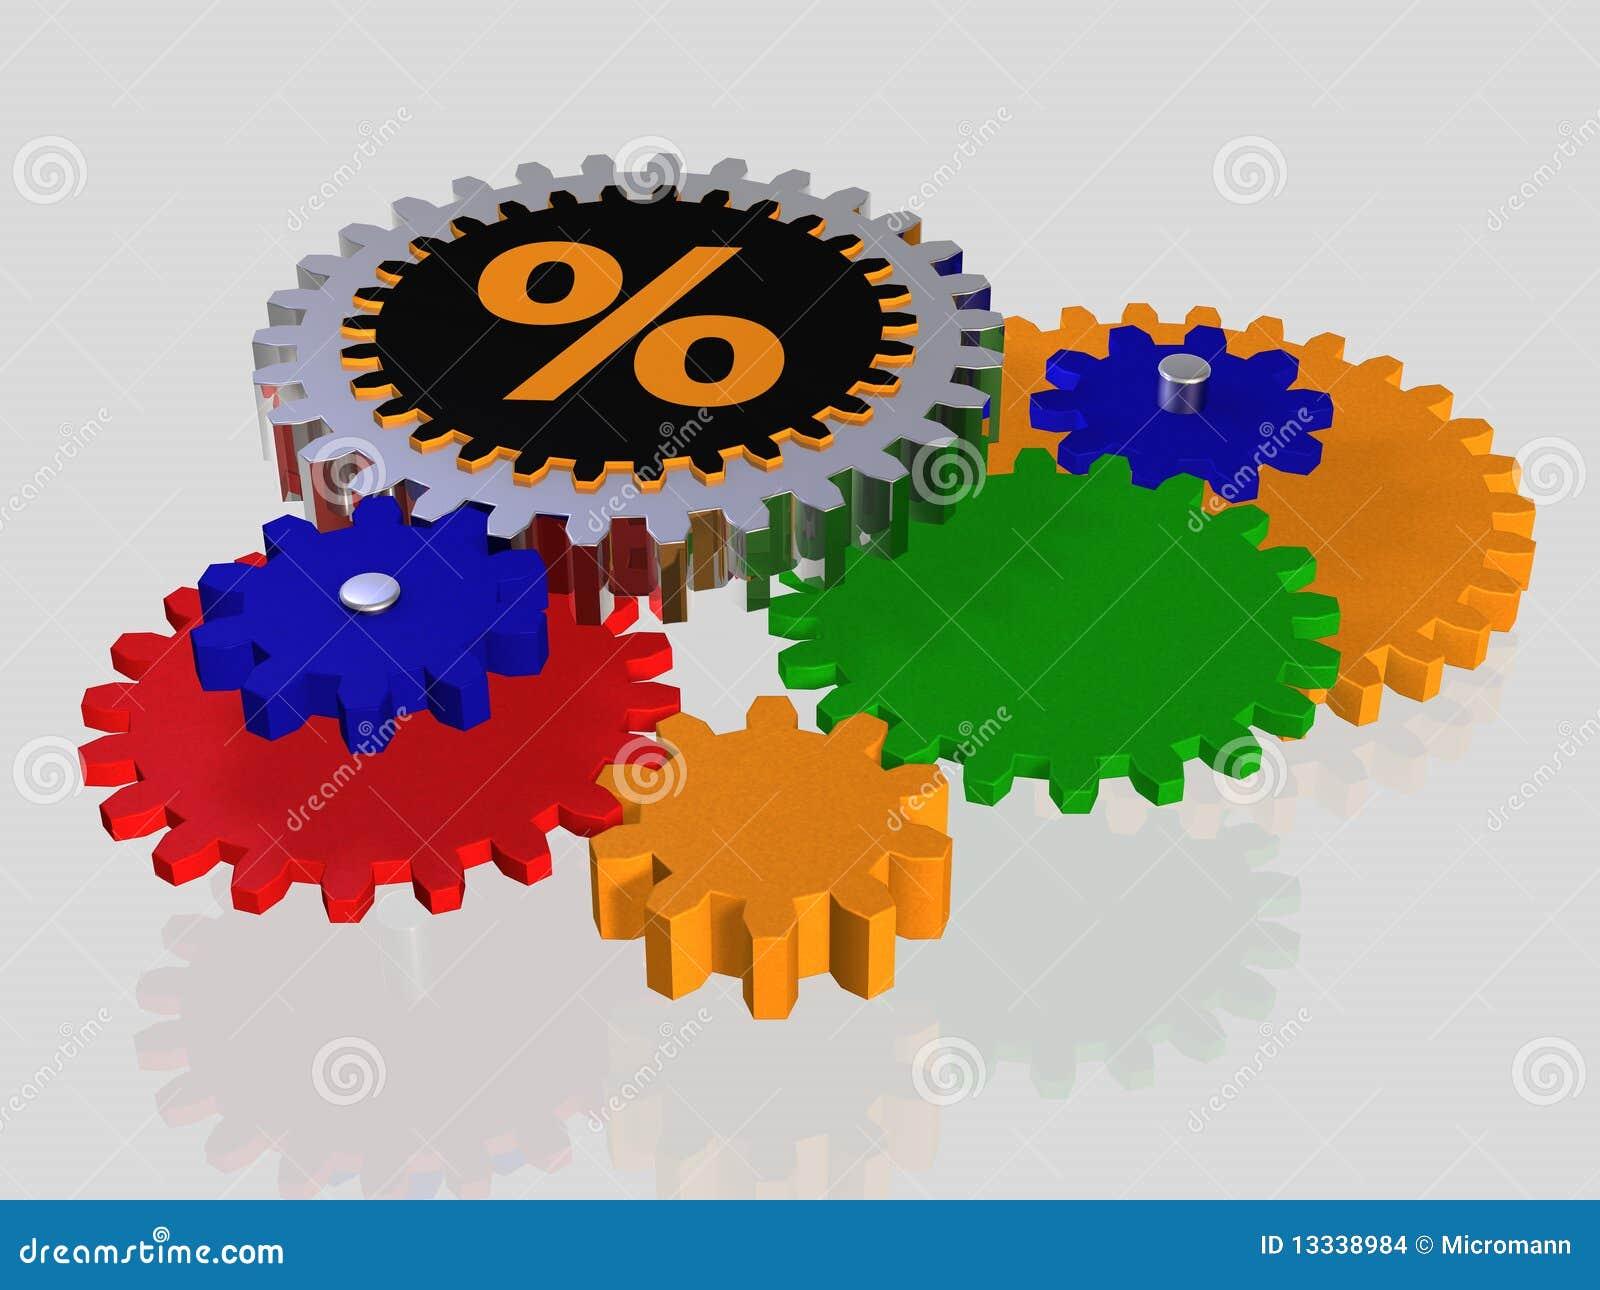 Percentage sign - gear